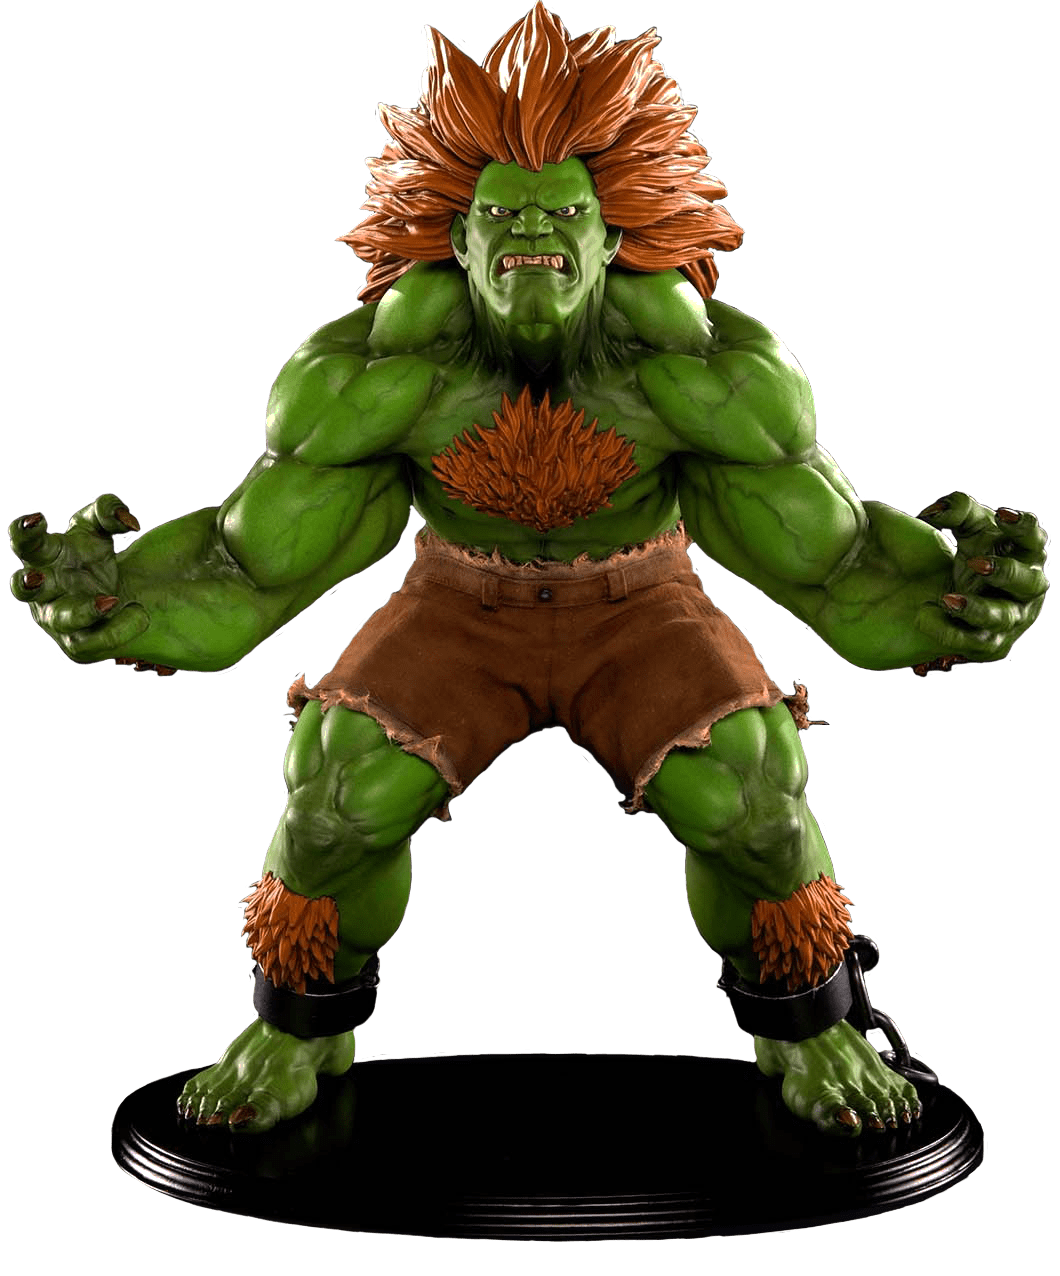 Estátua Blanka: Super Street Fighter IV (Escala 1/4) - Pop Culture Shock